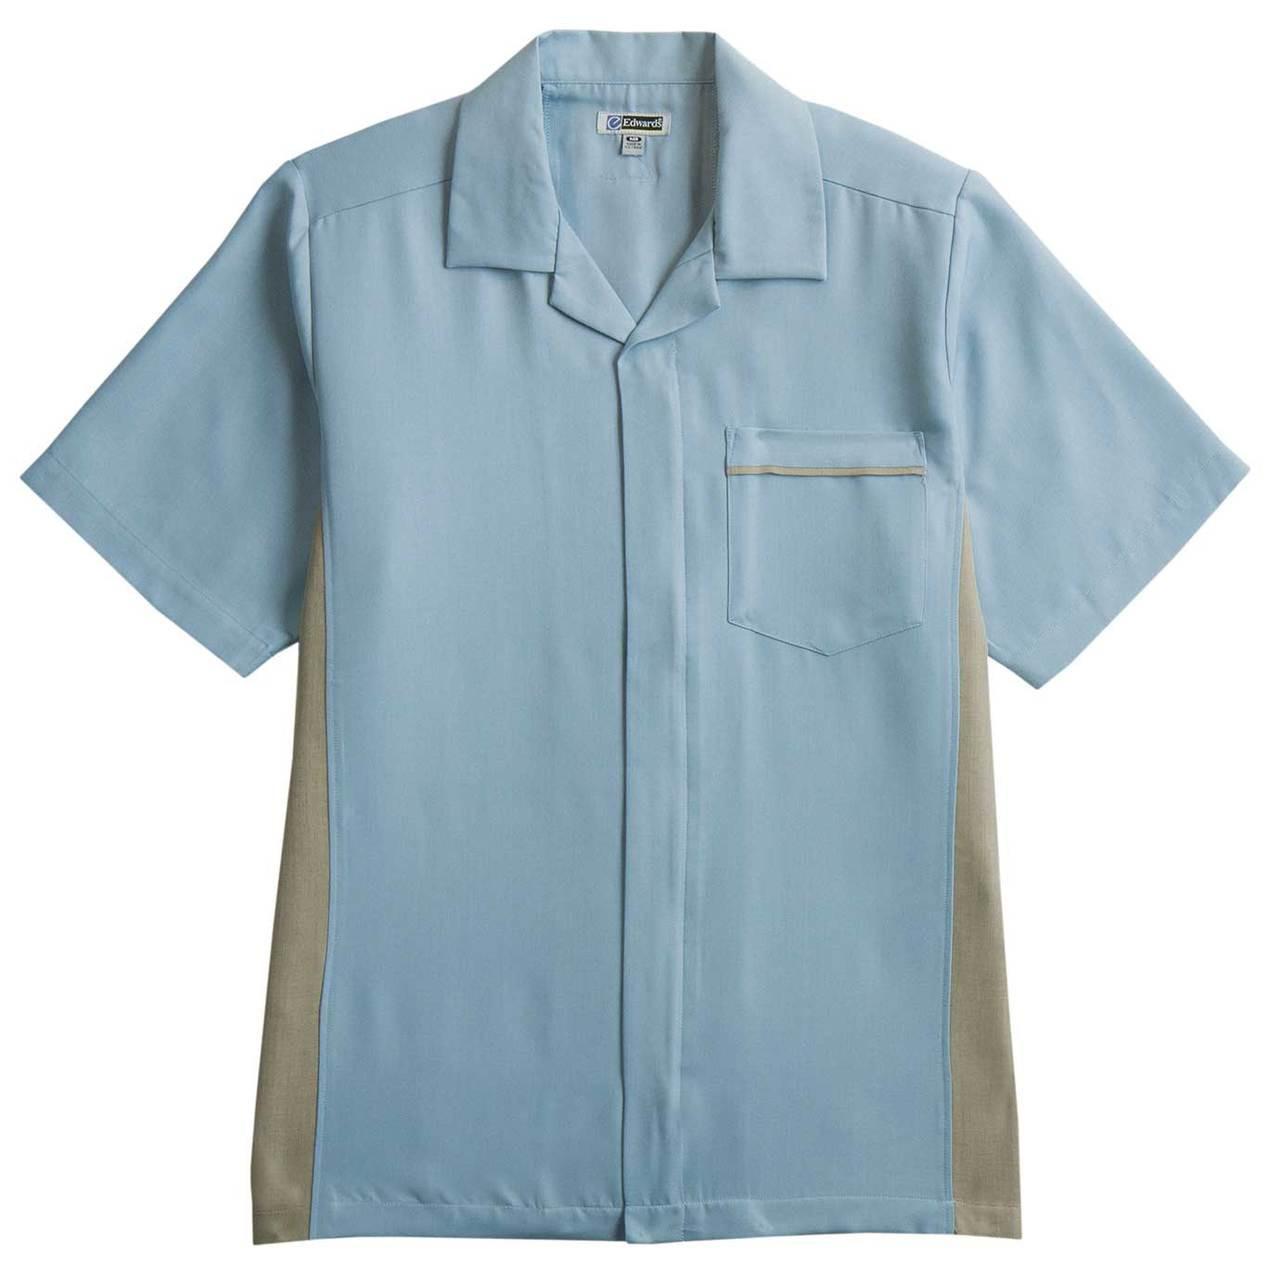 Premier Housekeeping Service Shirt